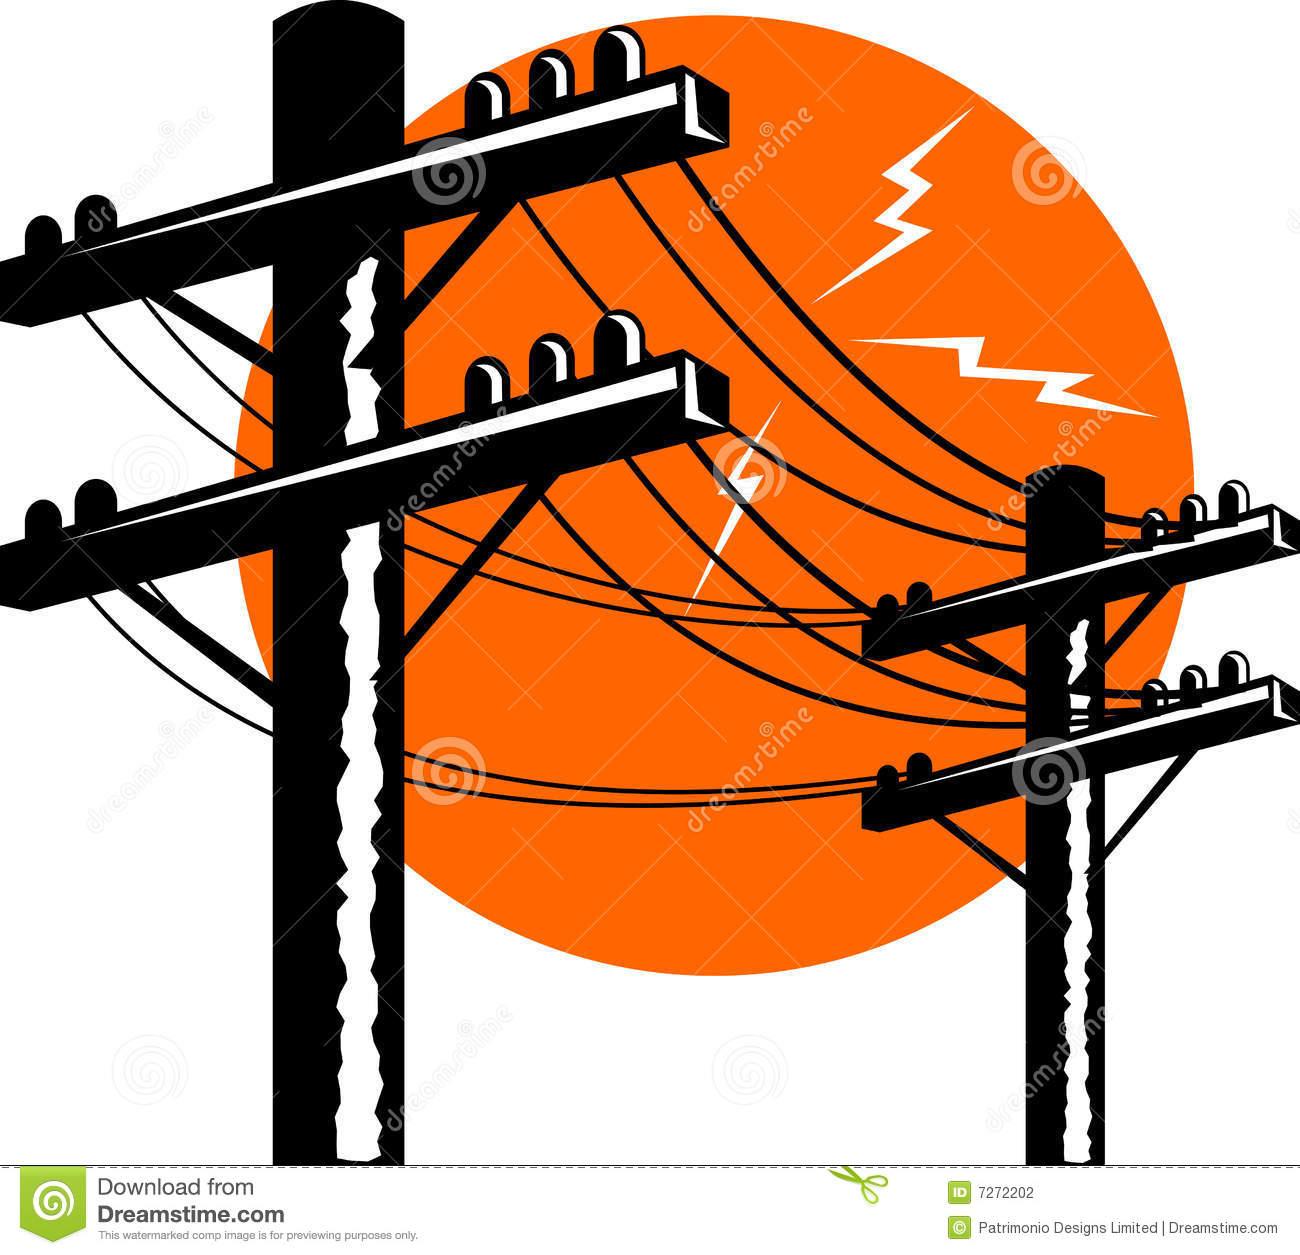 Electric clipart electric pole, Electric electric pole Transparent FREE for  download on WebStockReview 2020